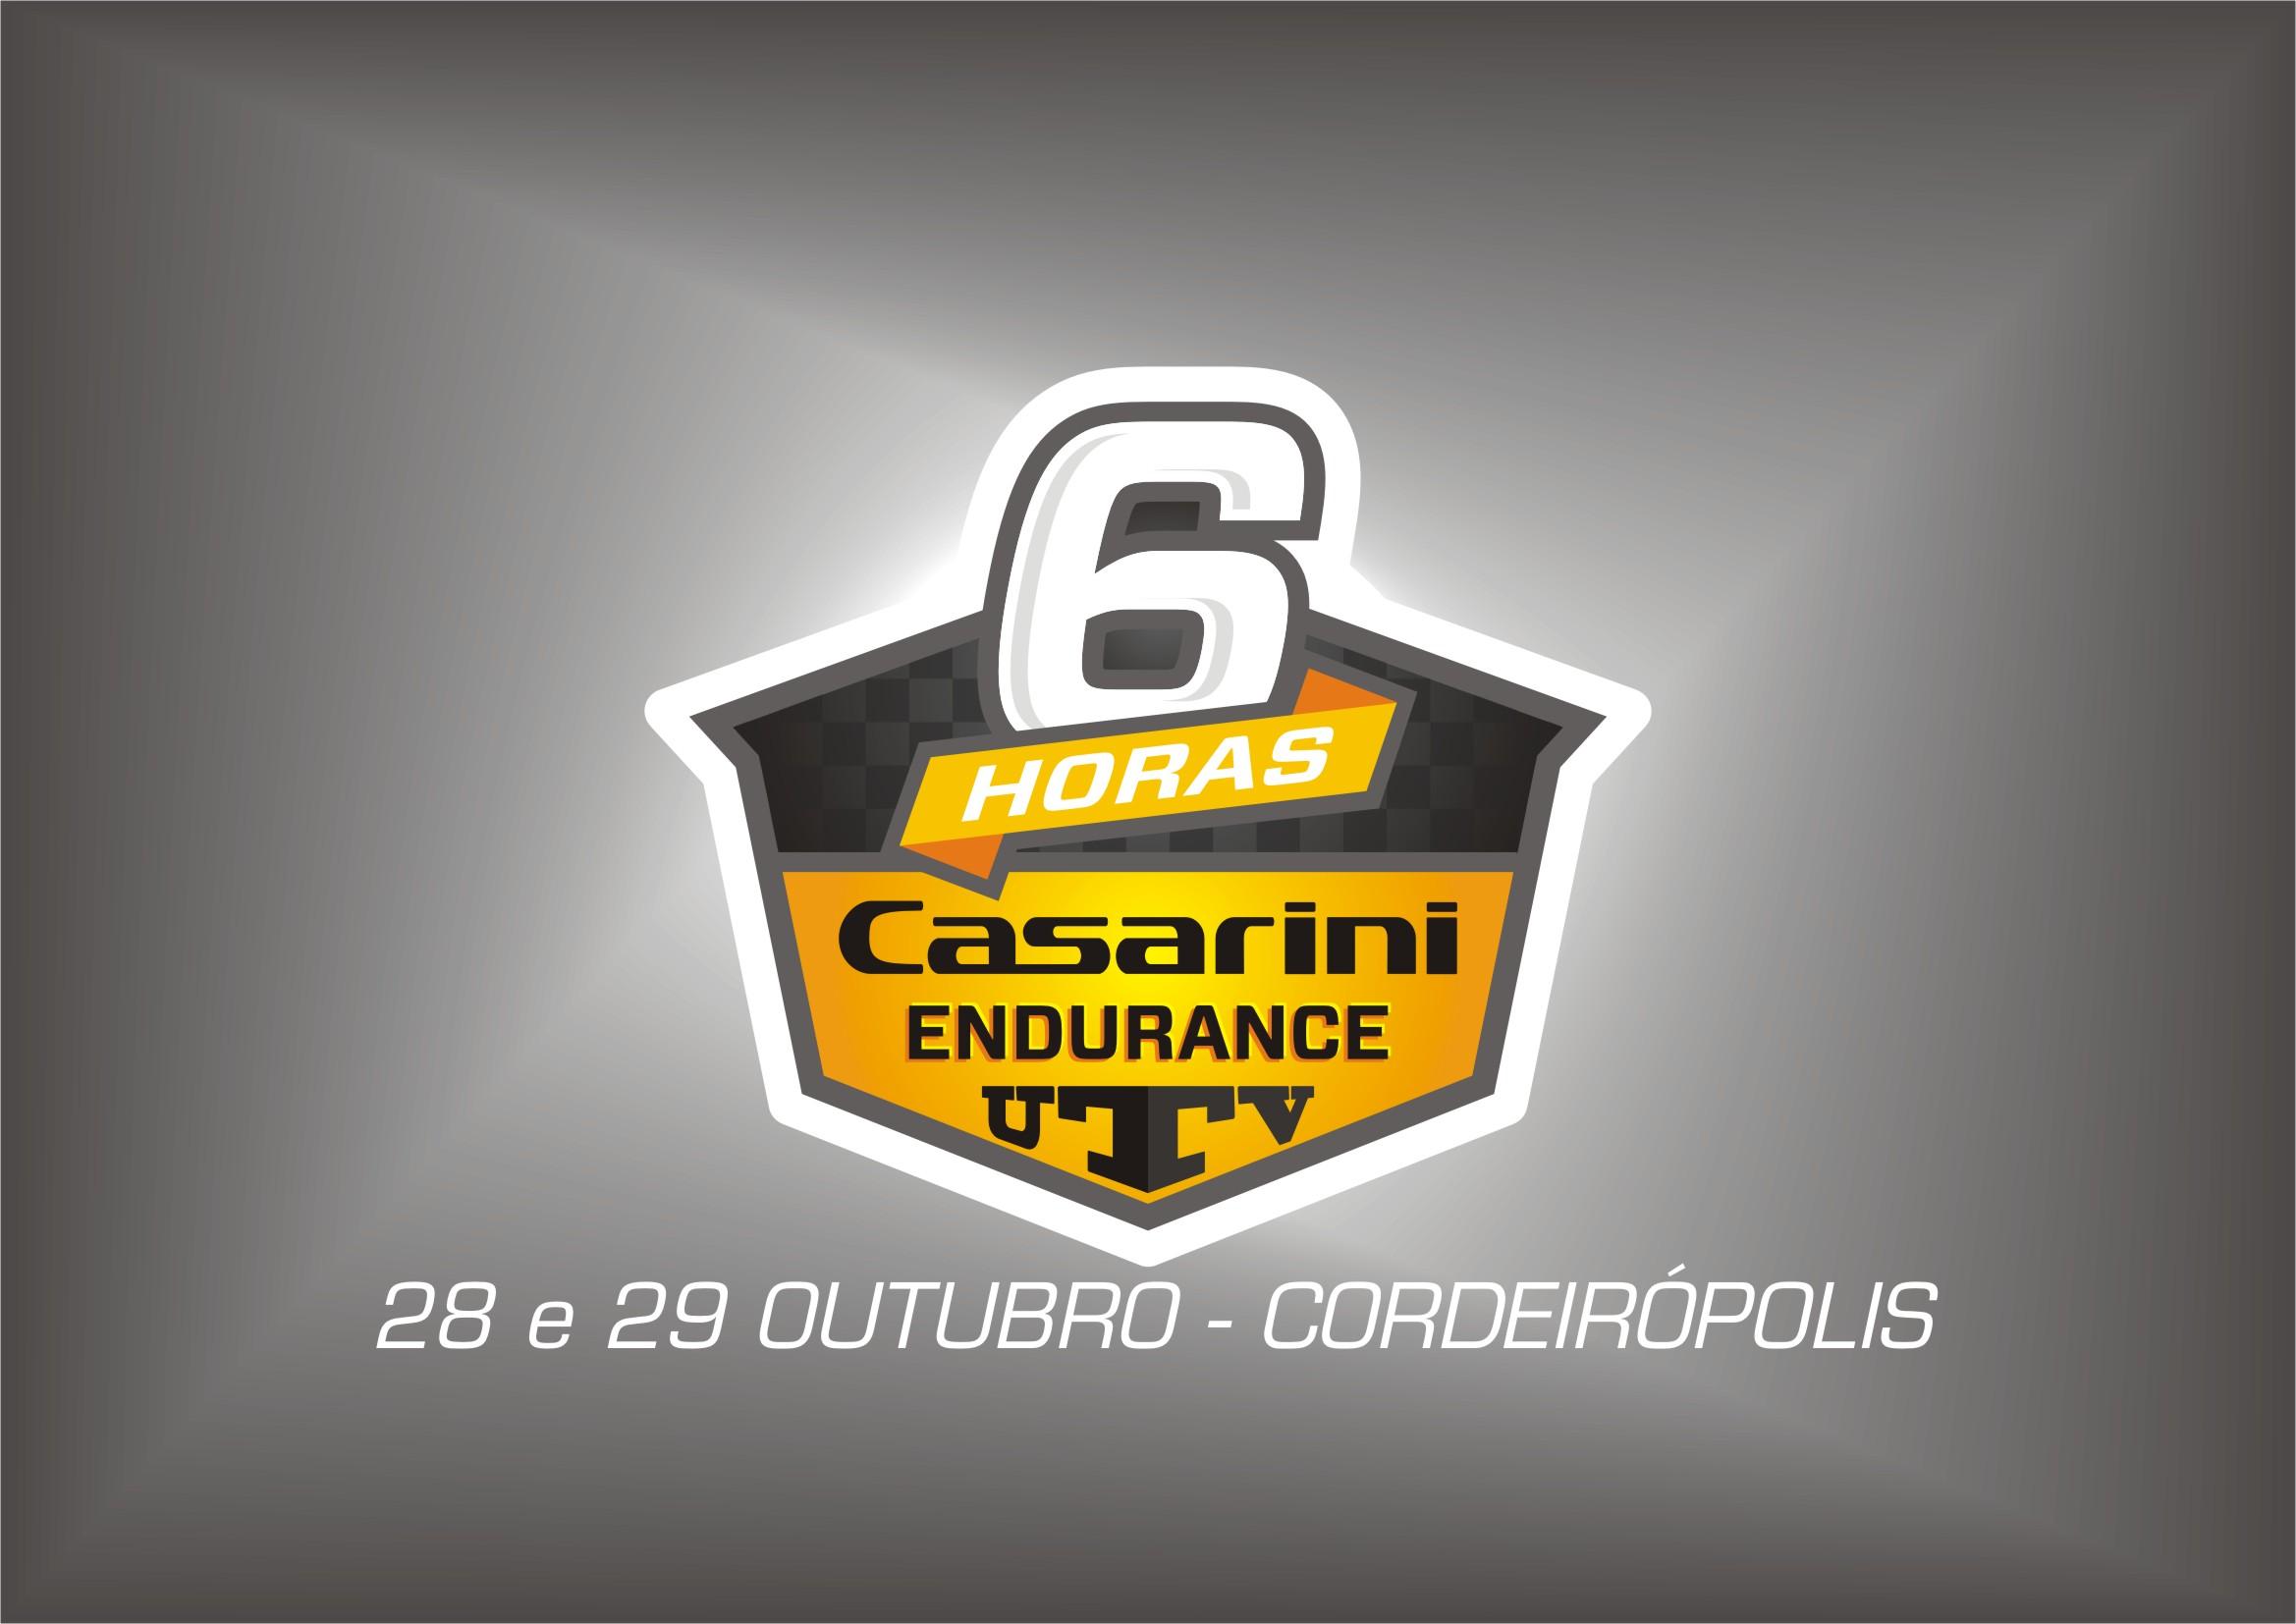 2° Copa 6 Horas Casarini Endurance UTV